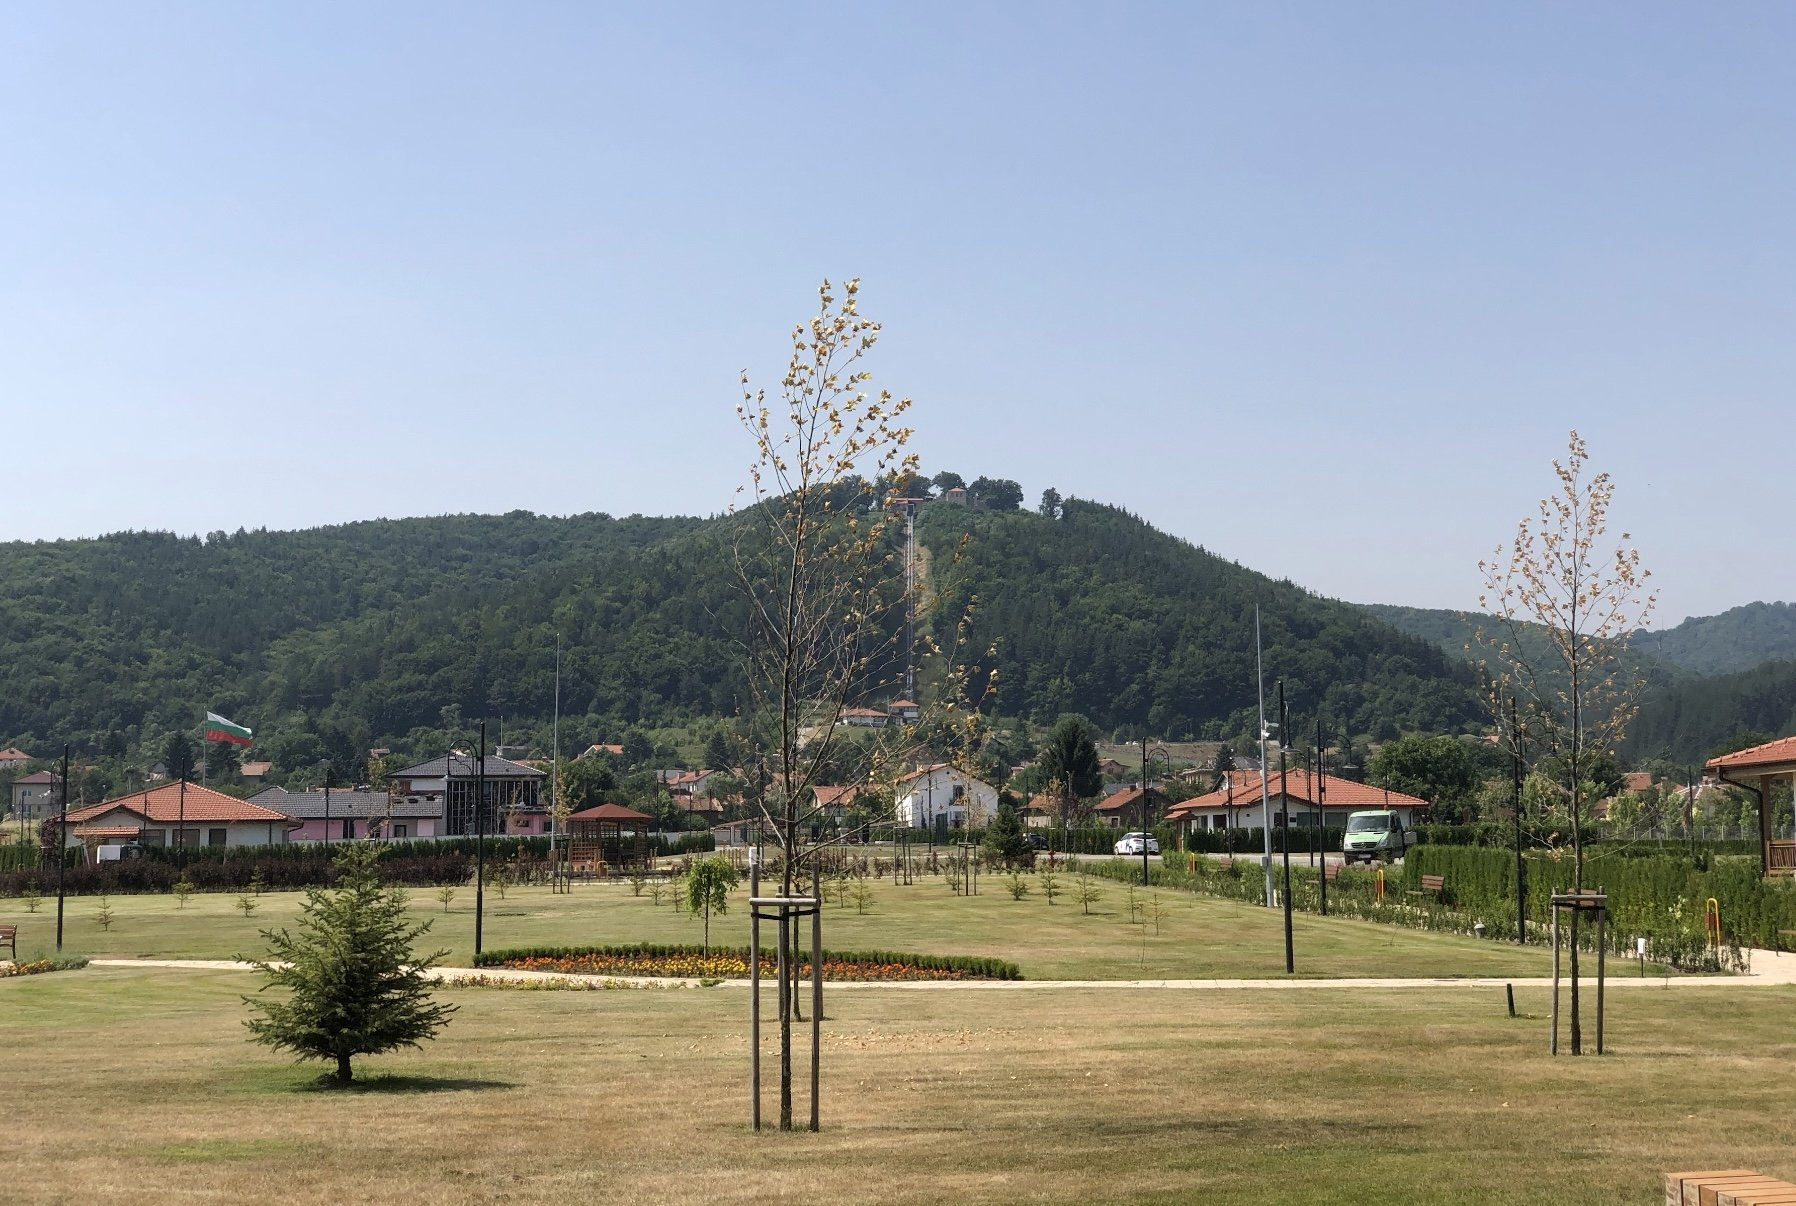 A view from the Belchin Spring, Belchin, Bulgaria.